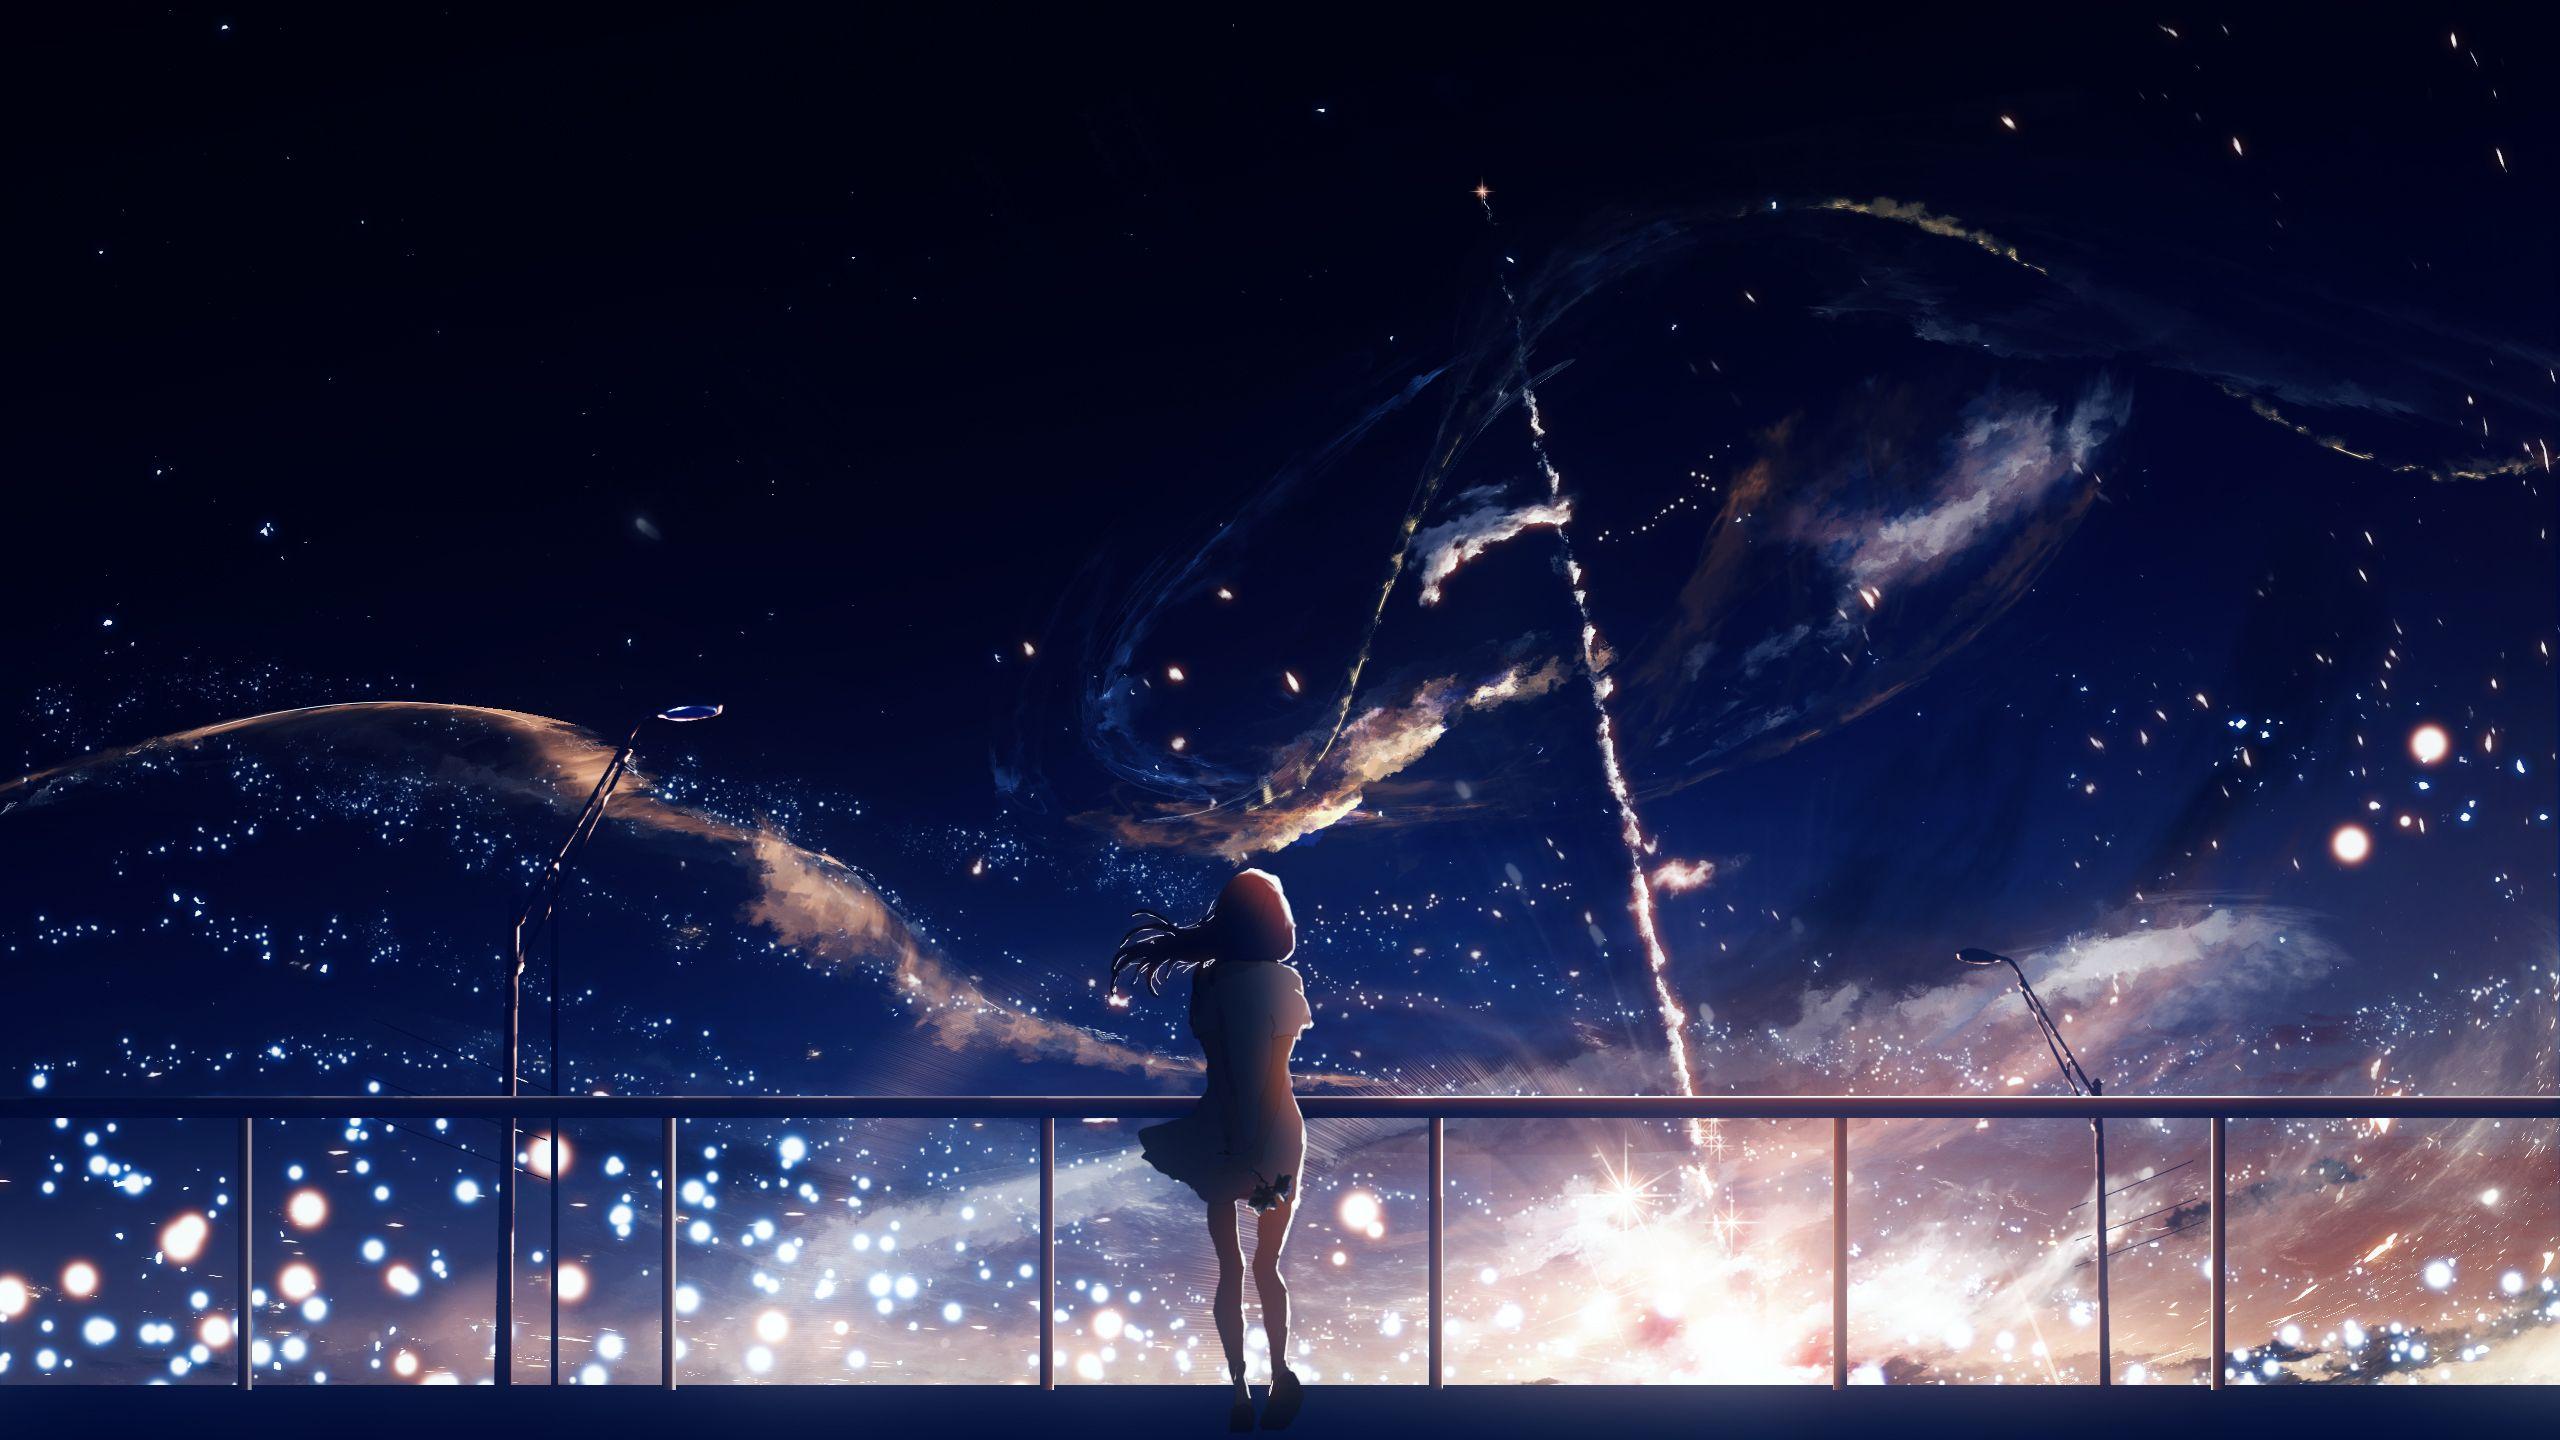 Wallpaper Gadis Anime Bintang Langit Malam 2560x1440 Baldkatz 1765133 Hd Wallpapers Wallhere